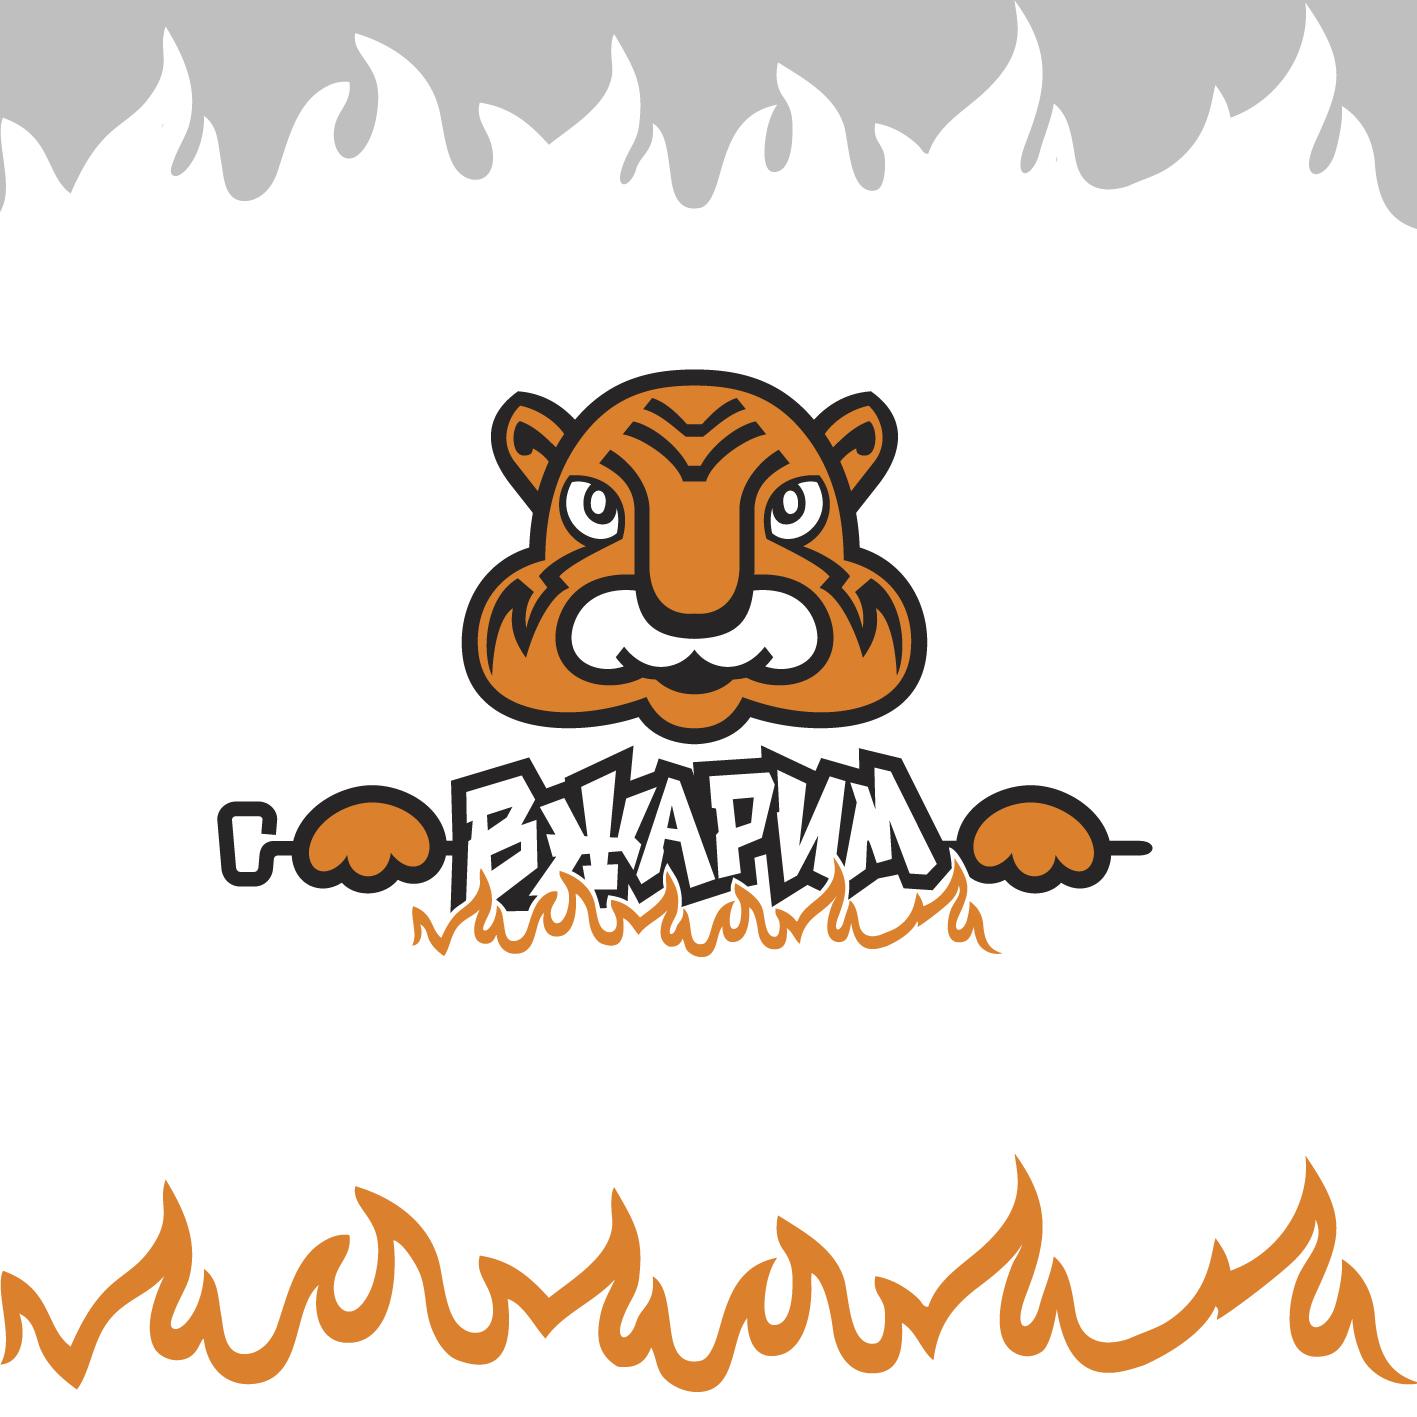 Требуется, разработка логотипа для крафт-кафе «ВЖАРИМ». фото f_7096009d95703ba4.png